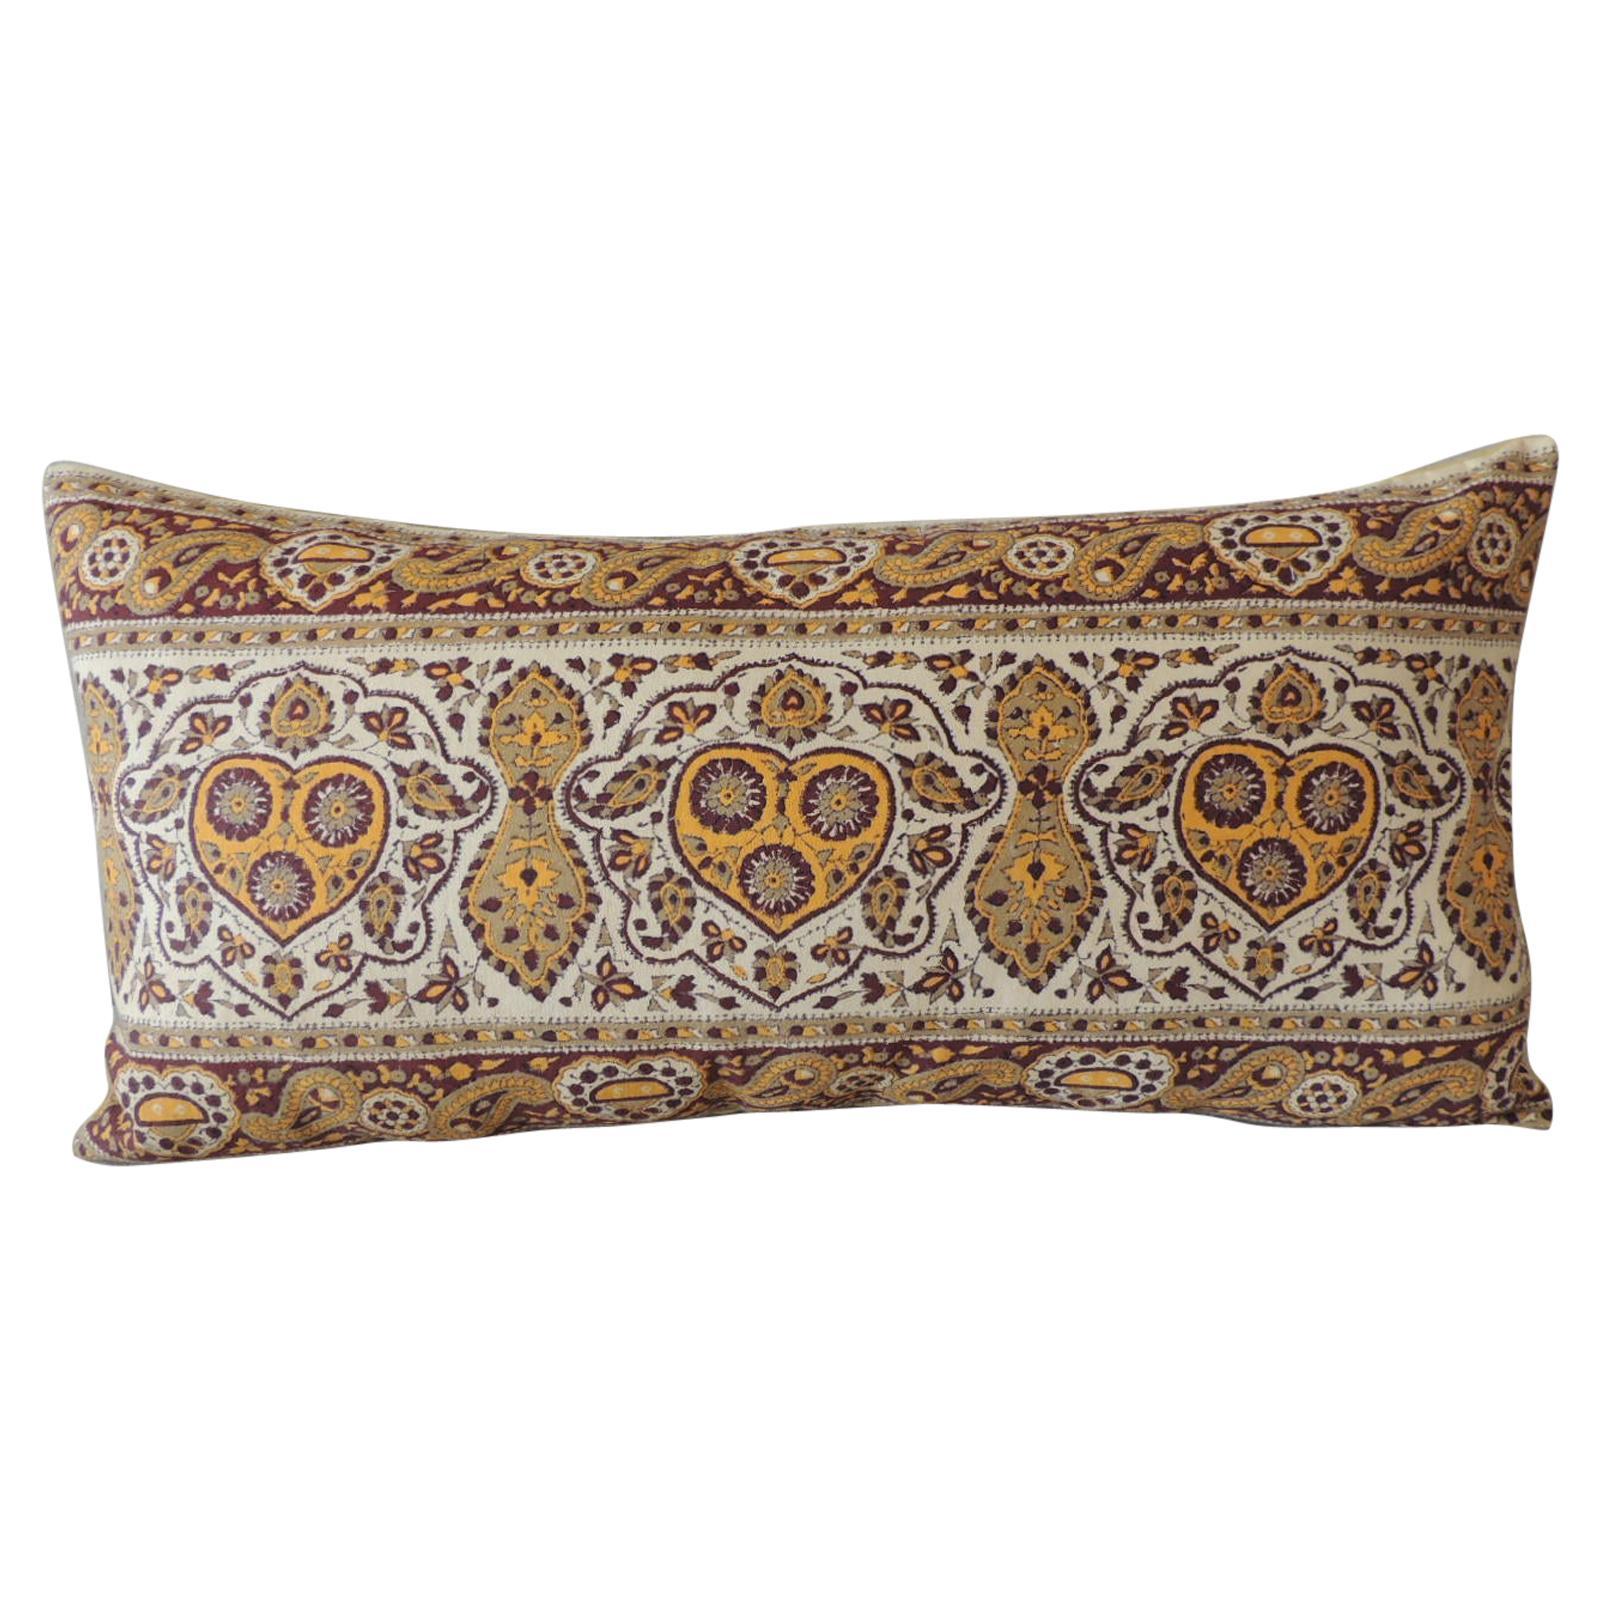 Vintage Hand-Blocked Kalamkari Long Bolster Decorative Pillow